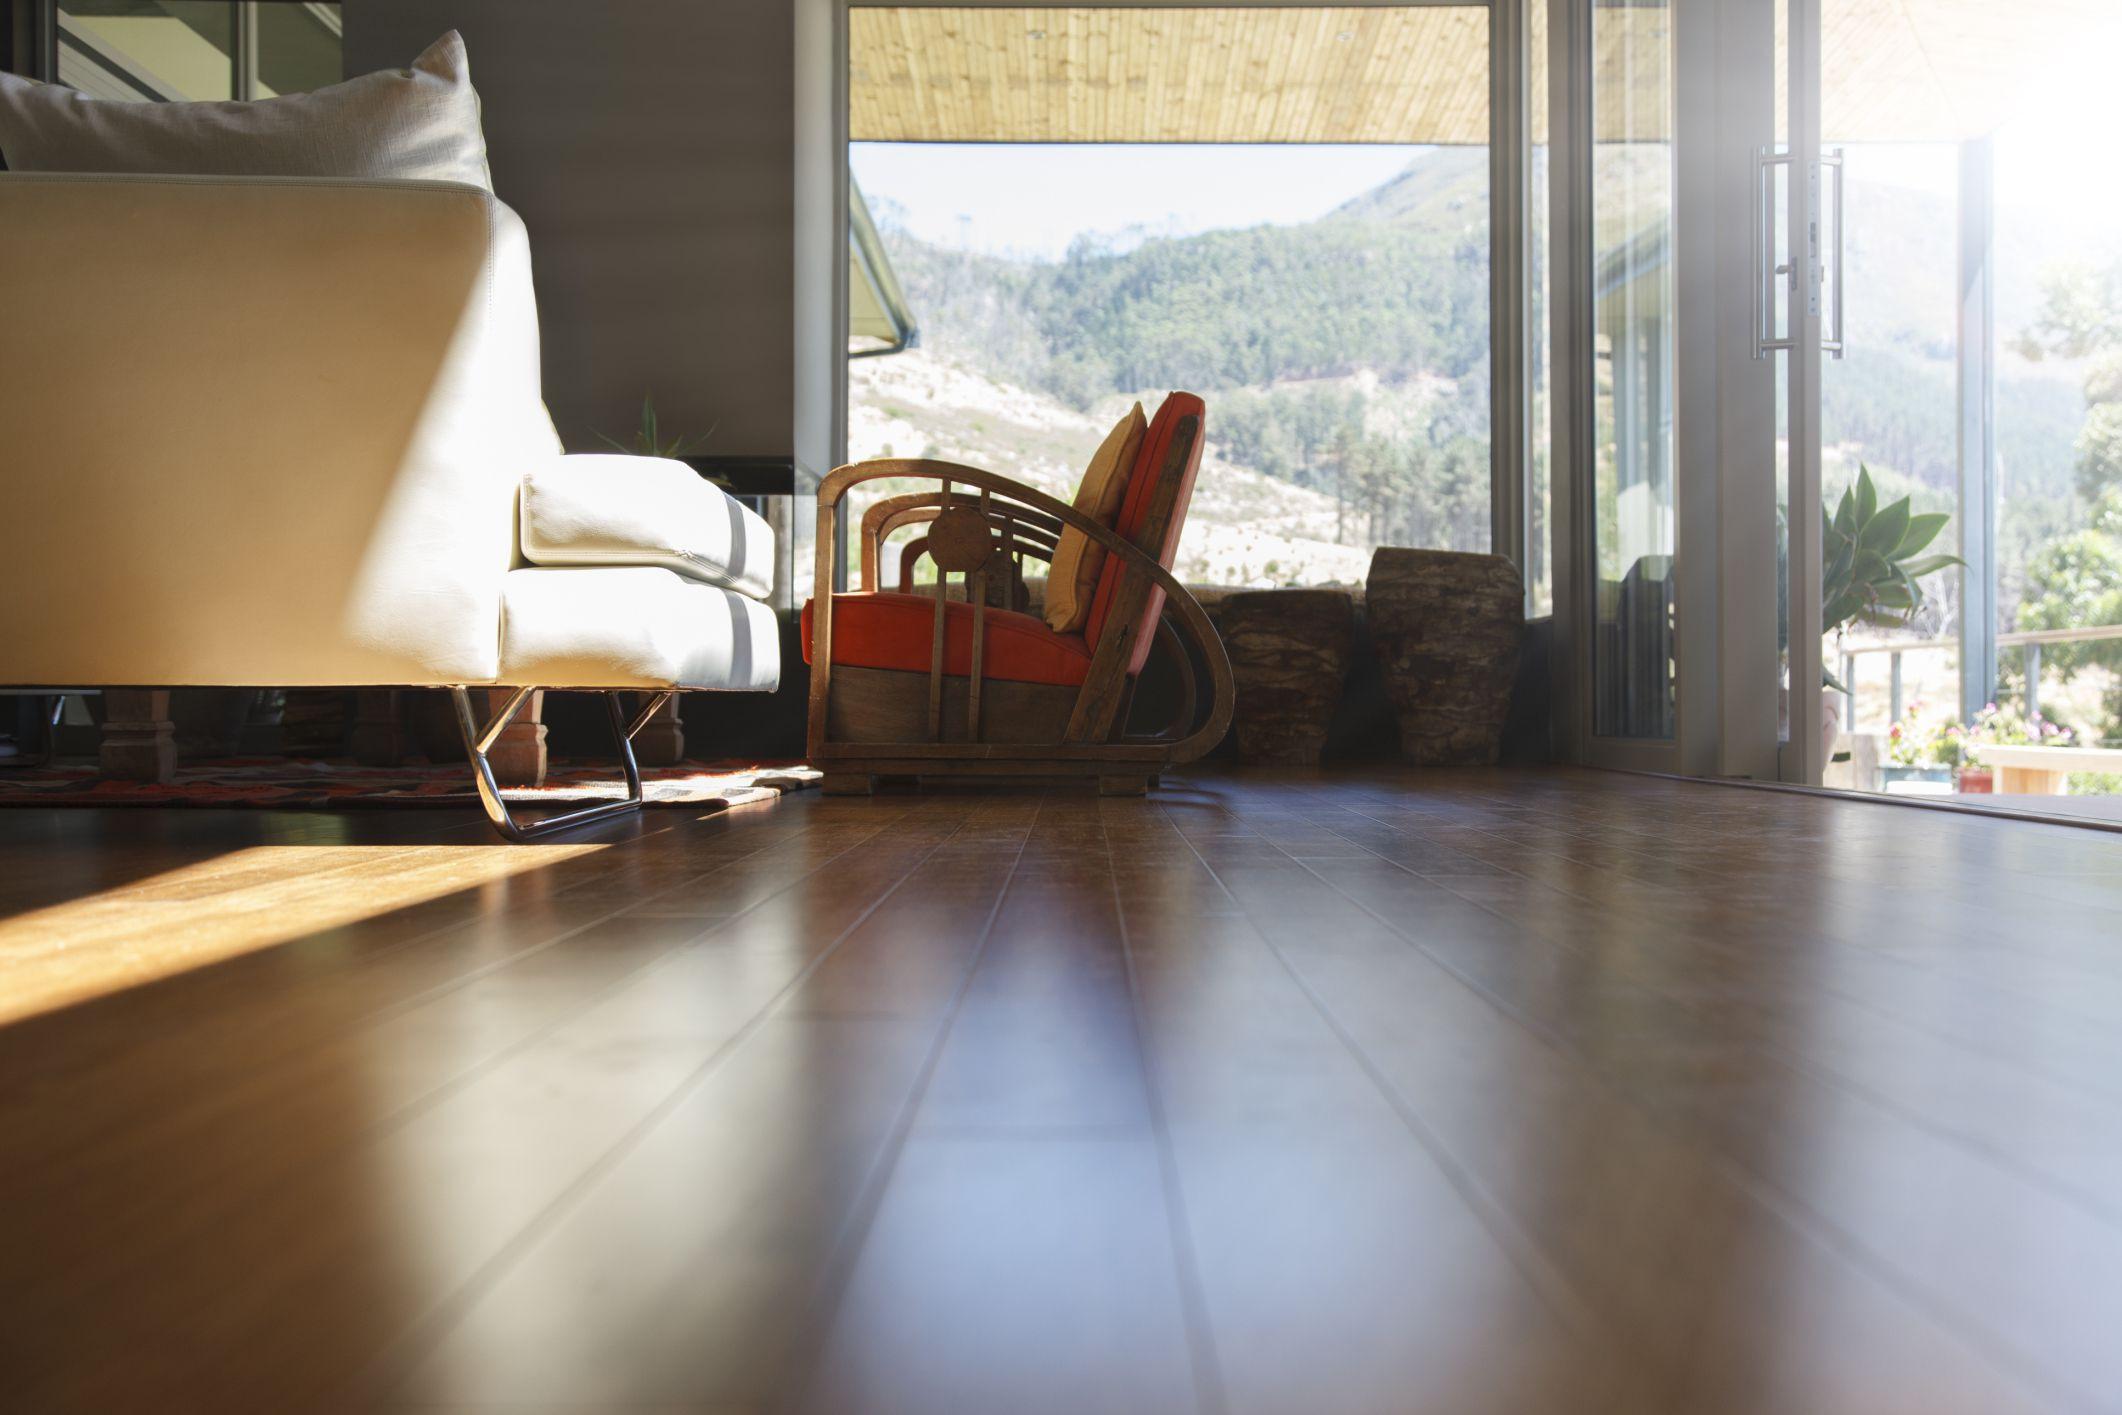 rustic wide plank engineered hardwood flooring of pros and cons of bellawood flooring from lumber liquidators inside exotic hardwood flooring 525439899 56a49d3a3df78cf77283453d